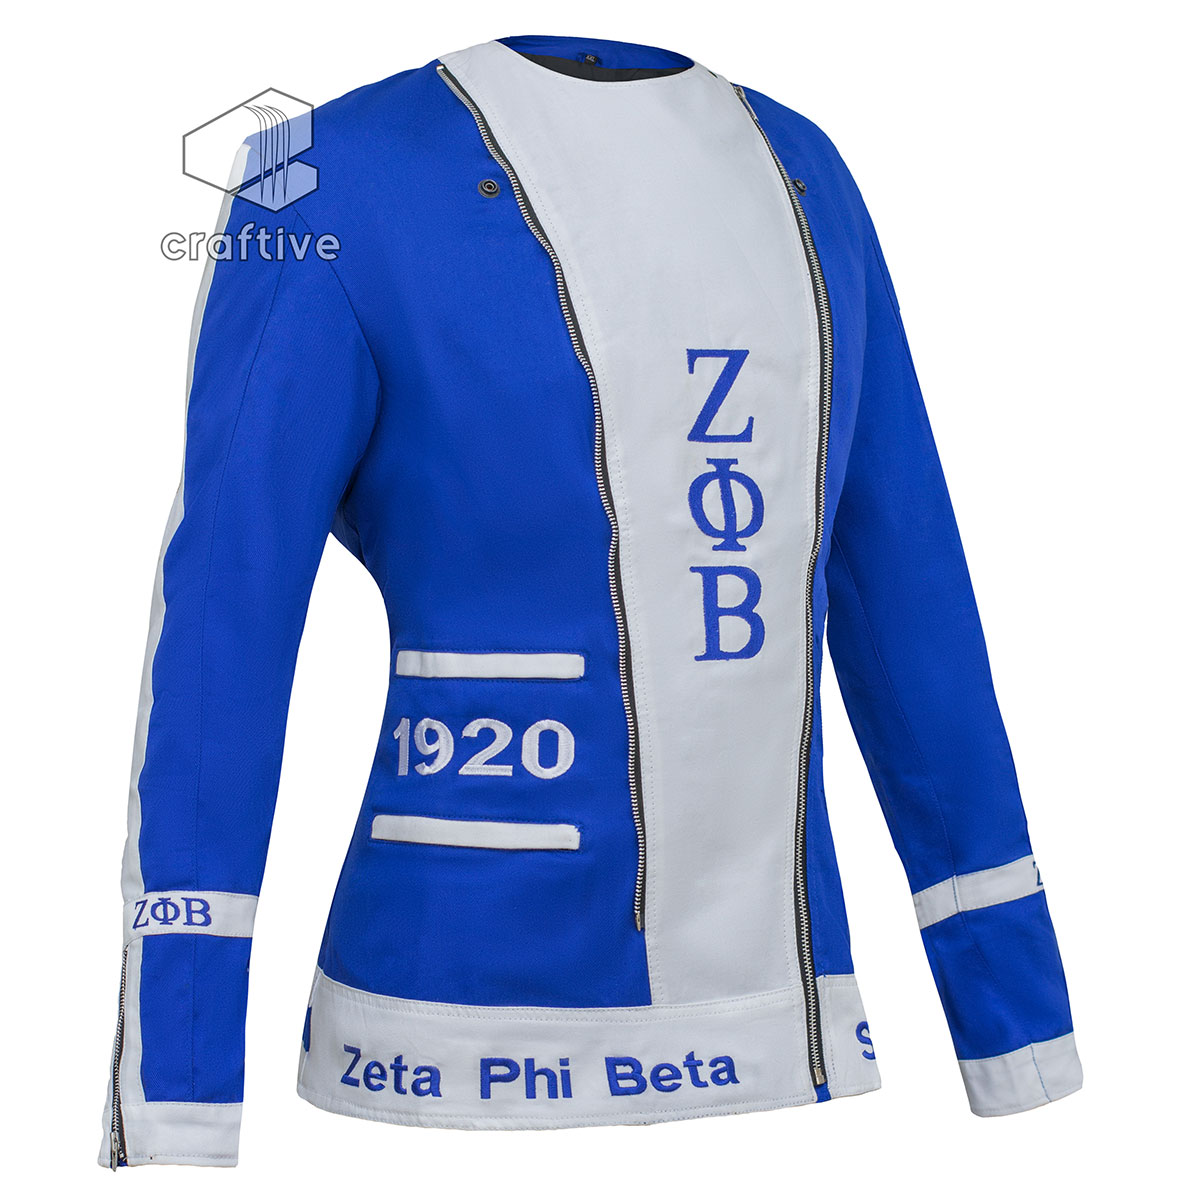 Zeta Phi Beta Crossing Jackets